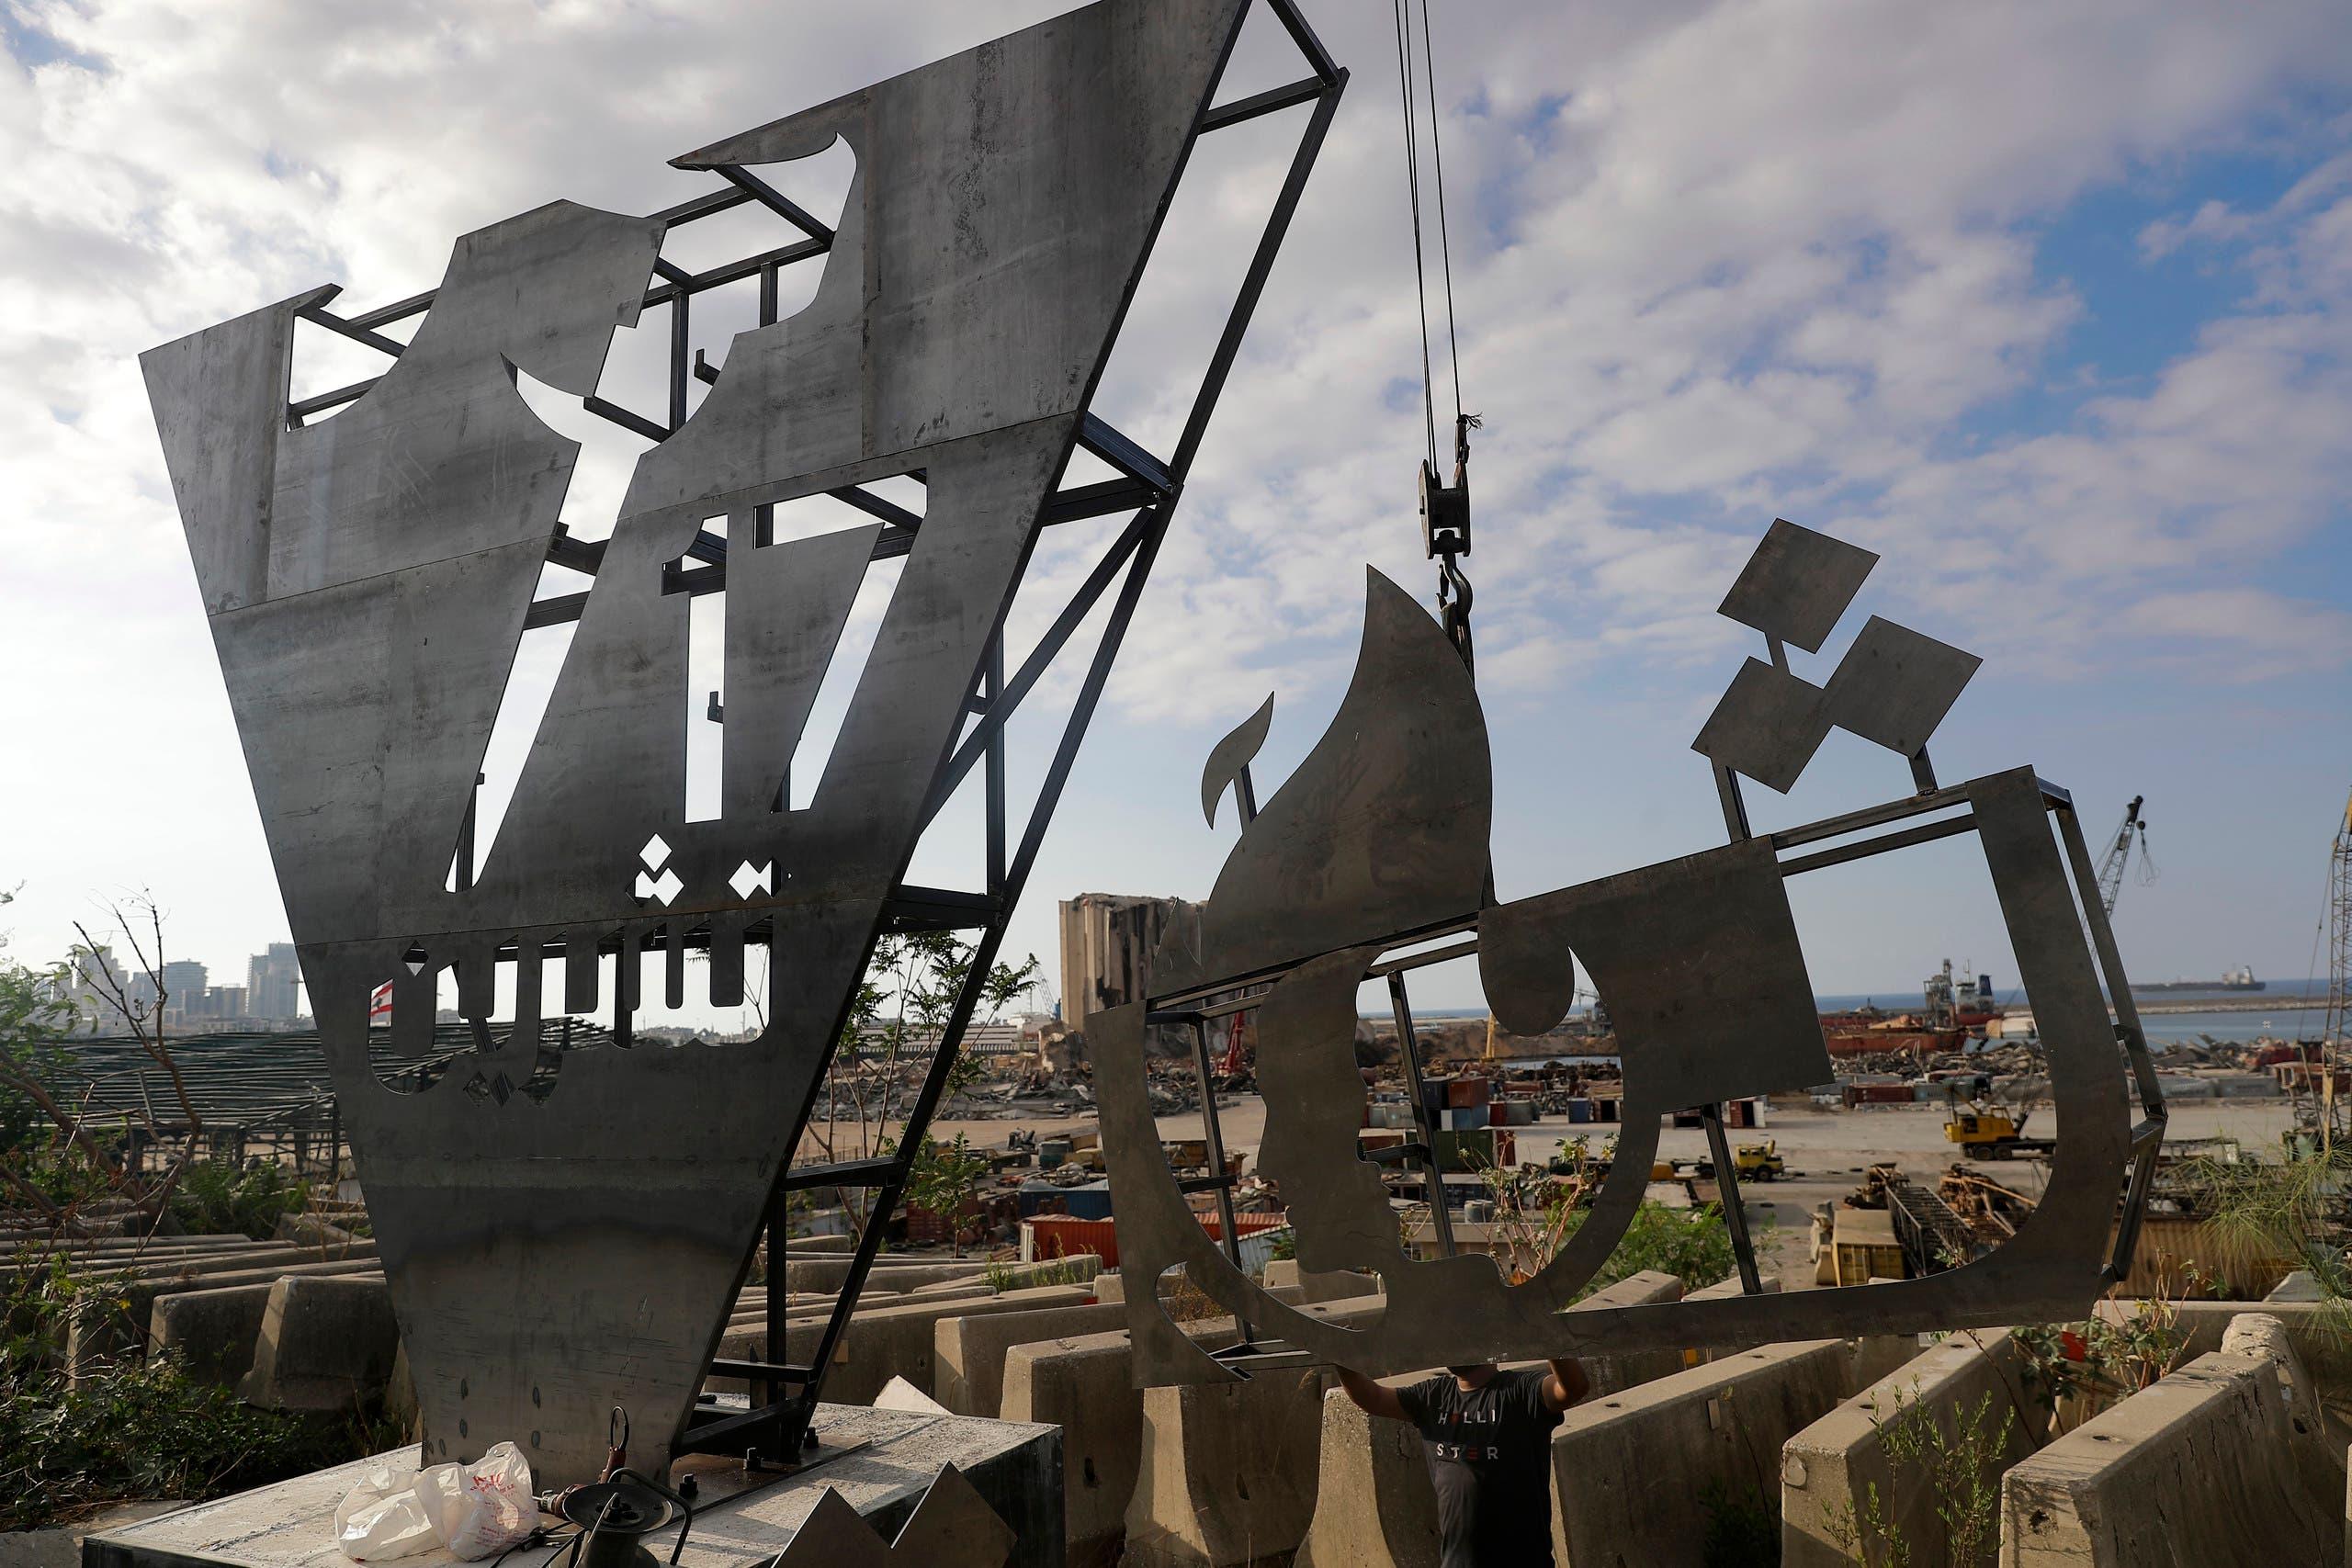 مجسم 17 تشرين (فرانس برس)